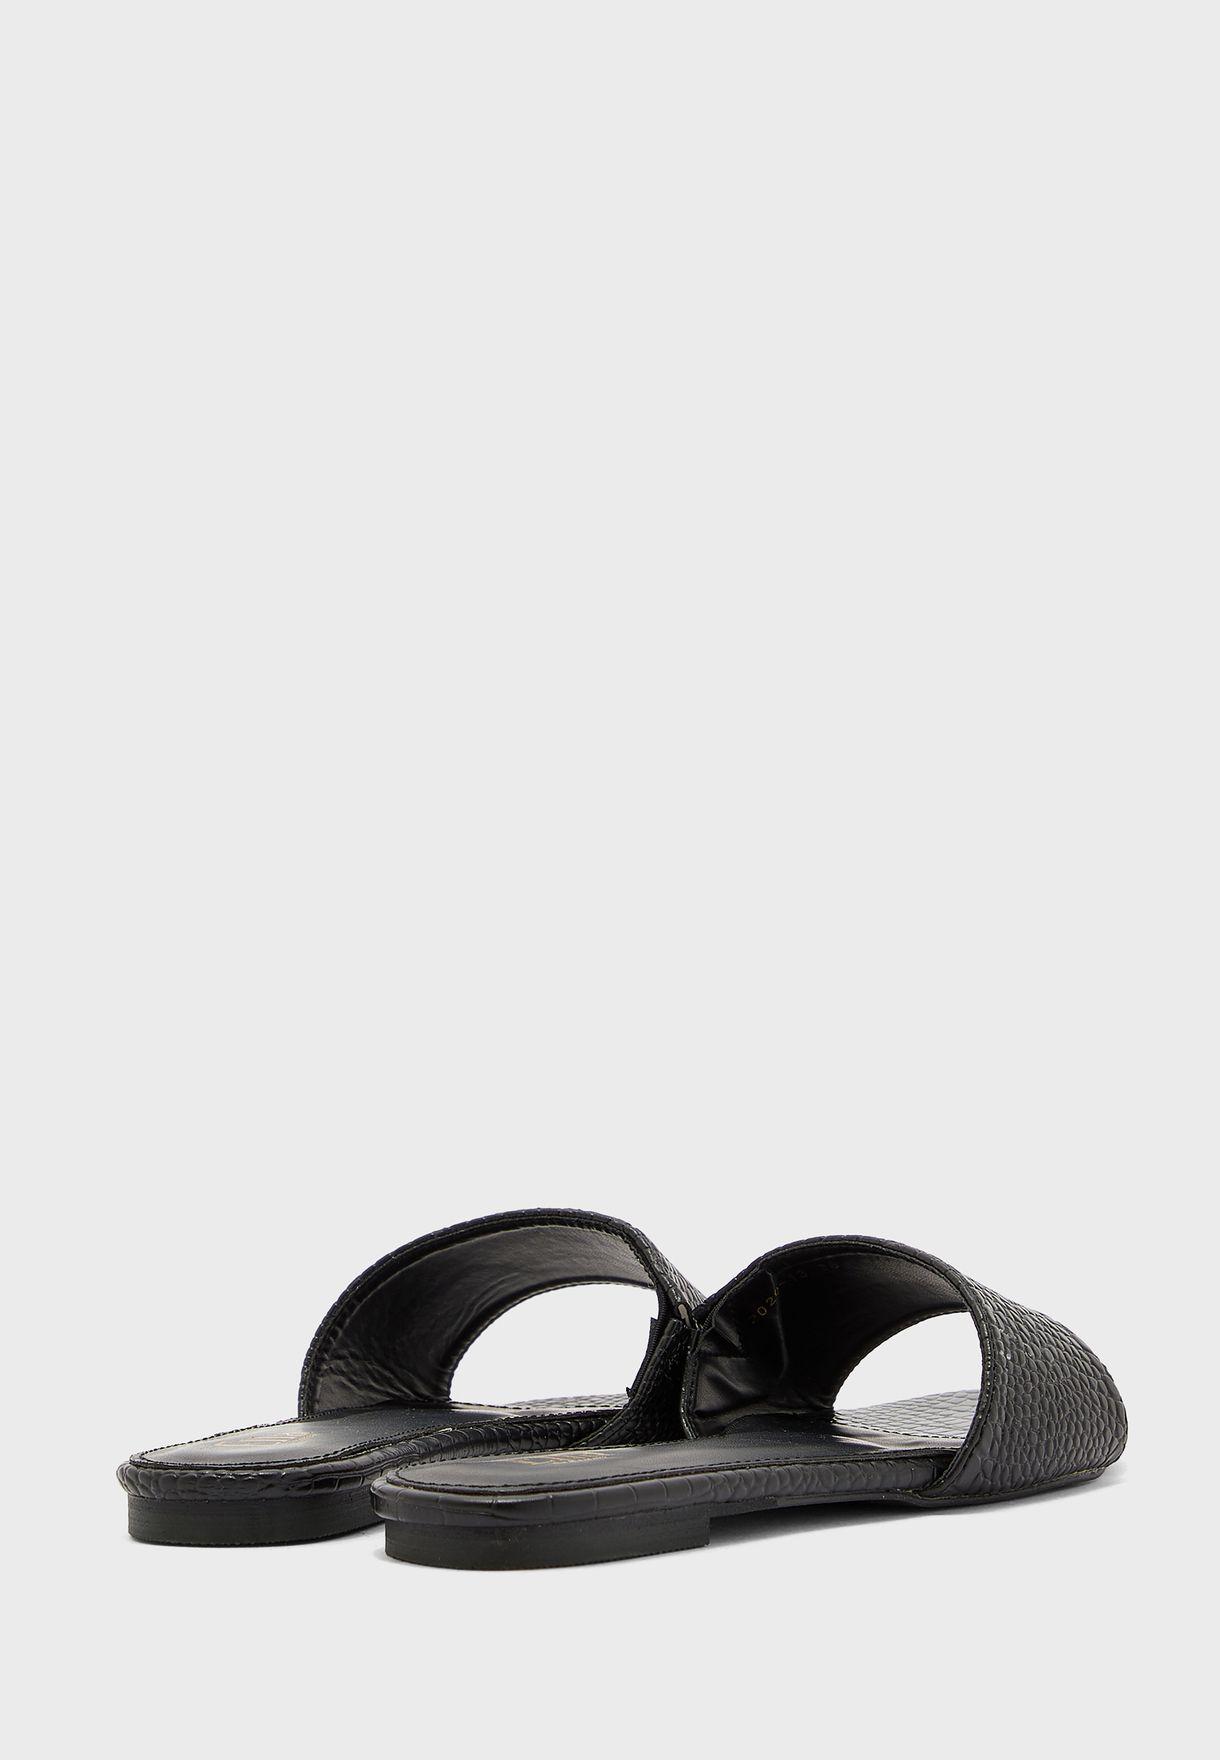 Croc Slip On Flat Sandal